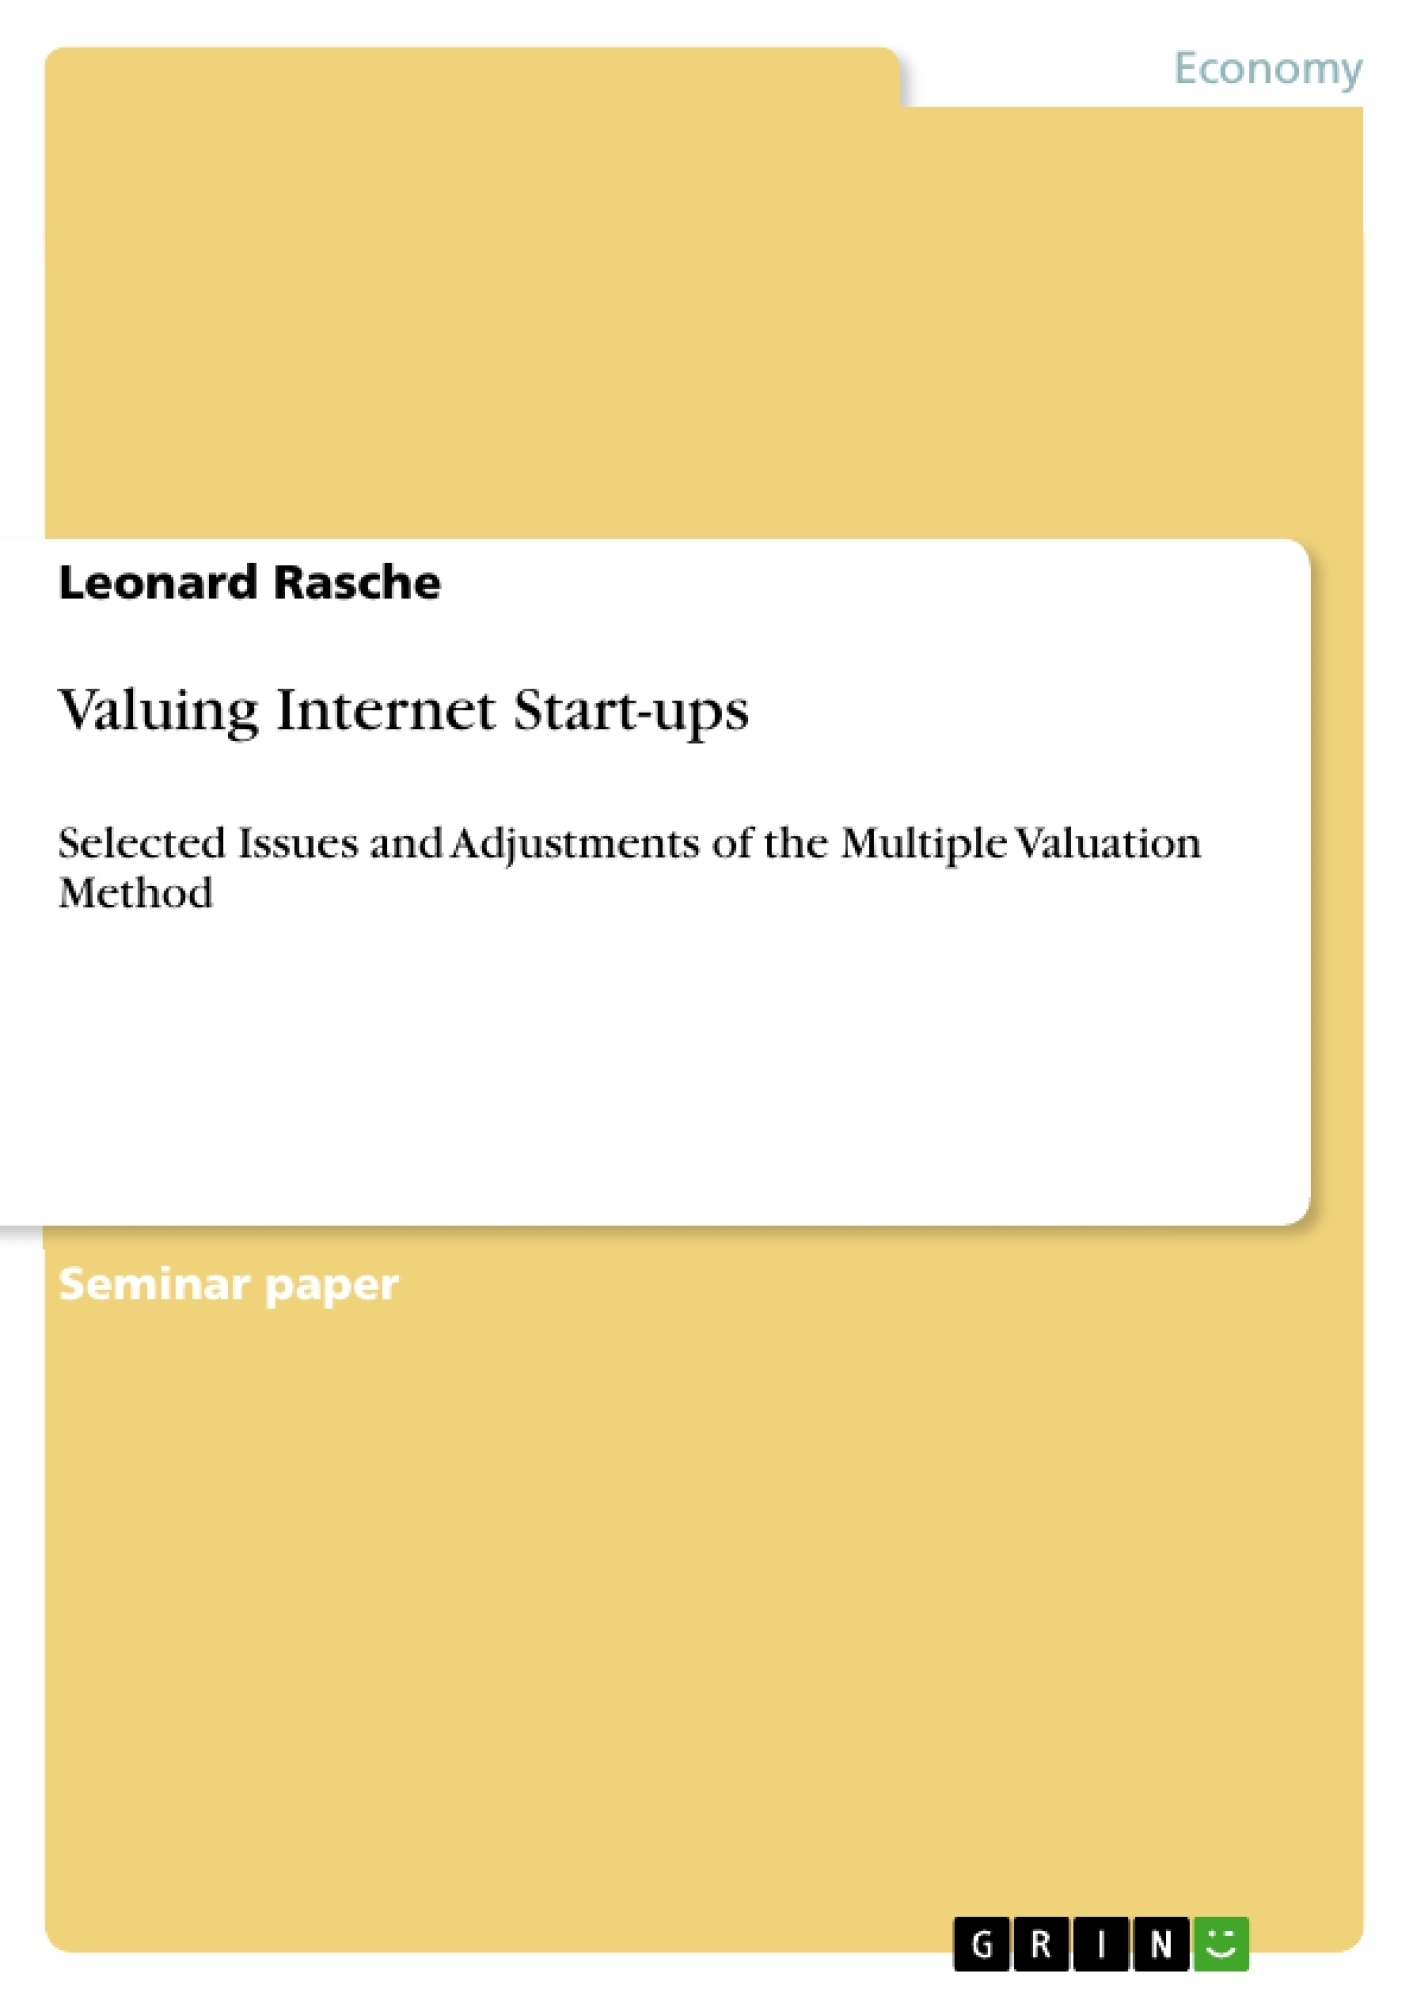 Title: Valuing Internet Start-ups